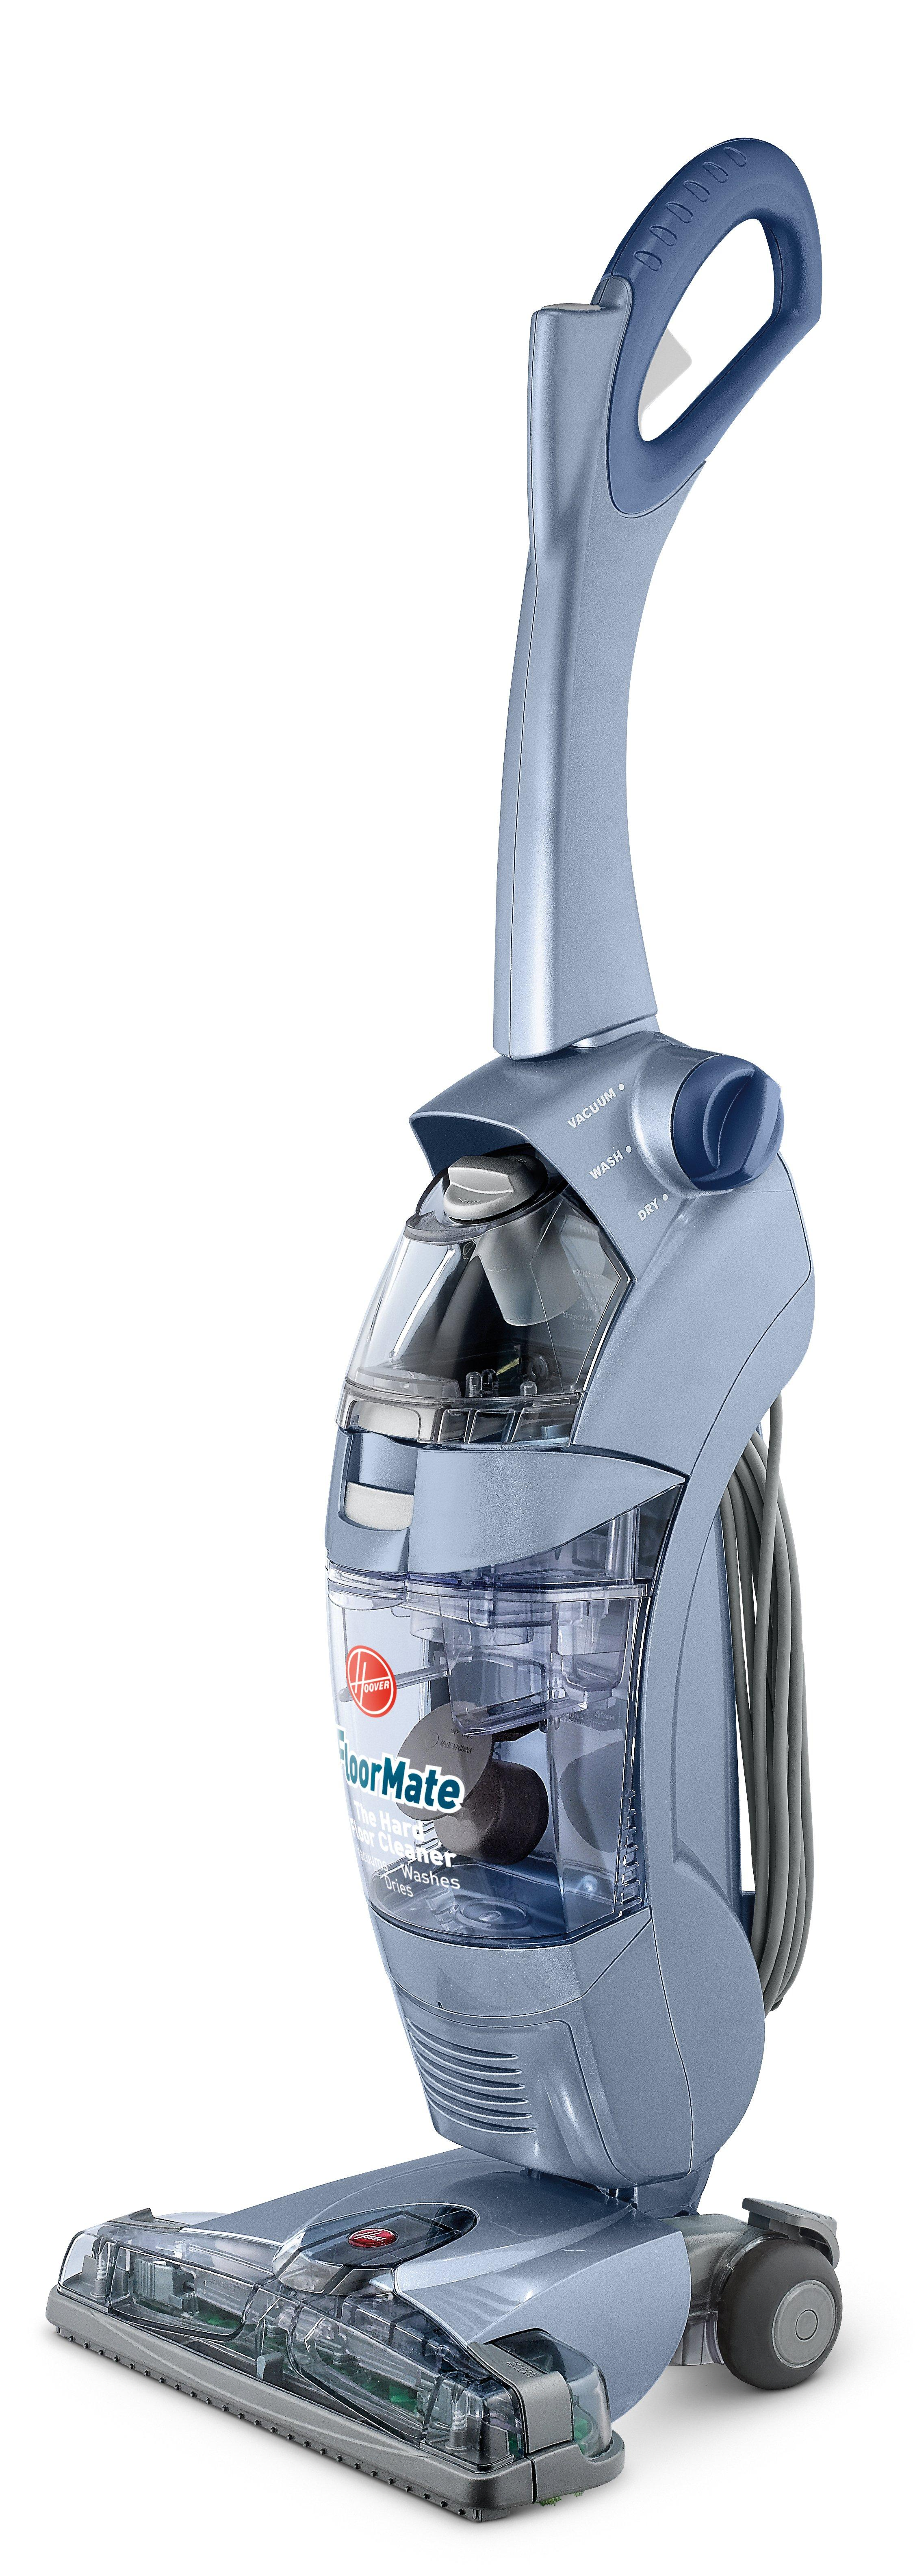 FloorMate SpinScrub 3in1 Hard Floor Cleaner  FH40010B